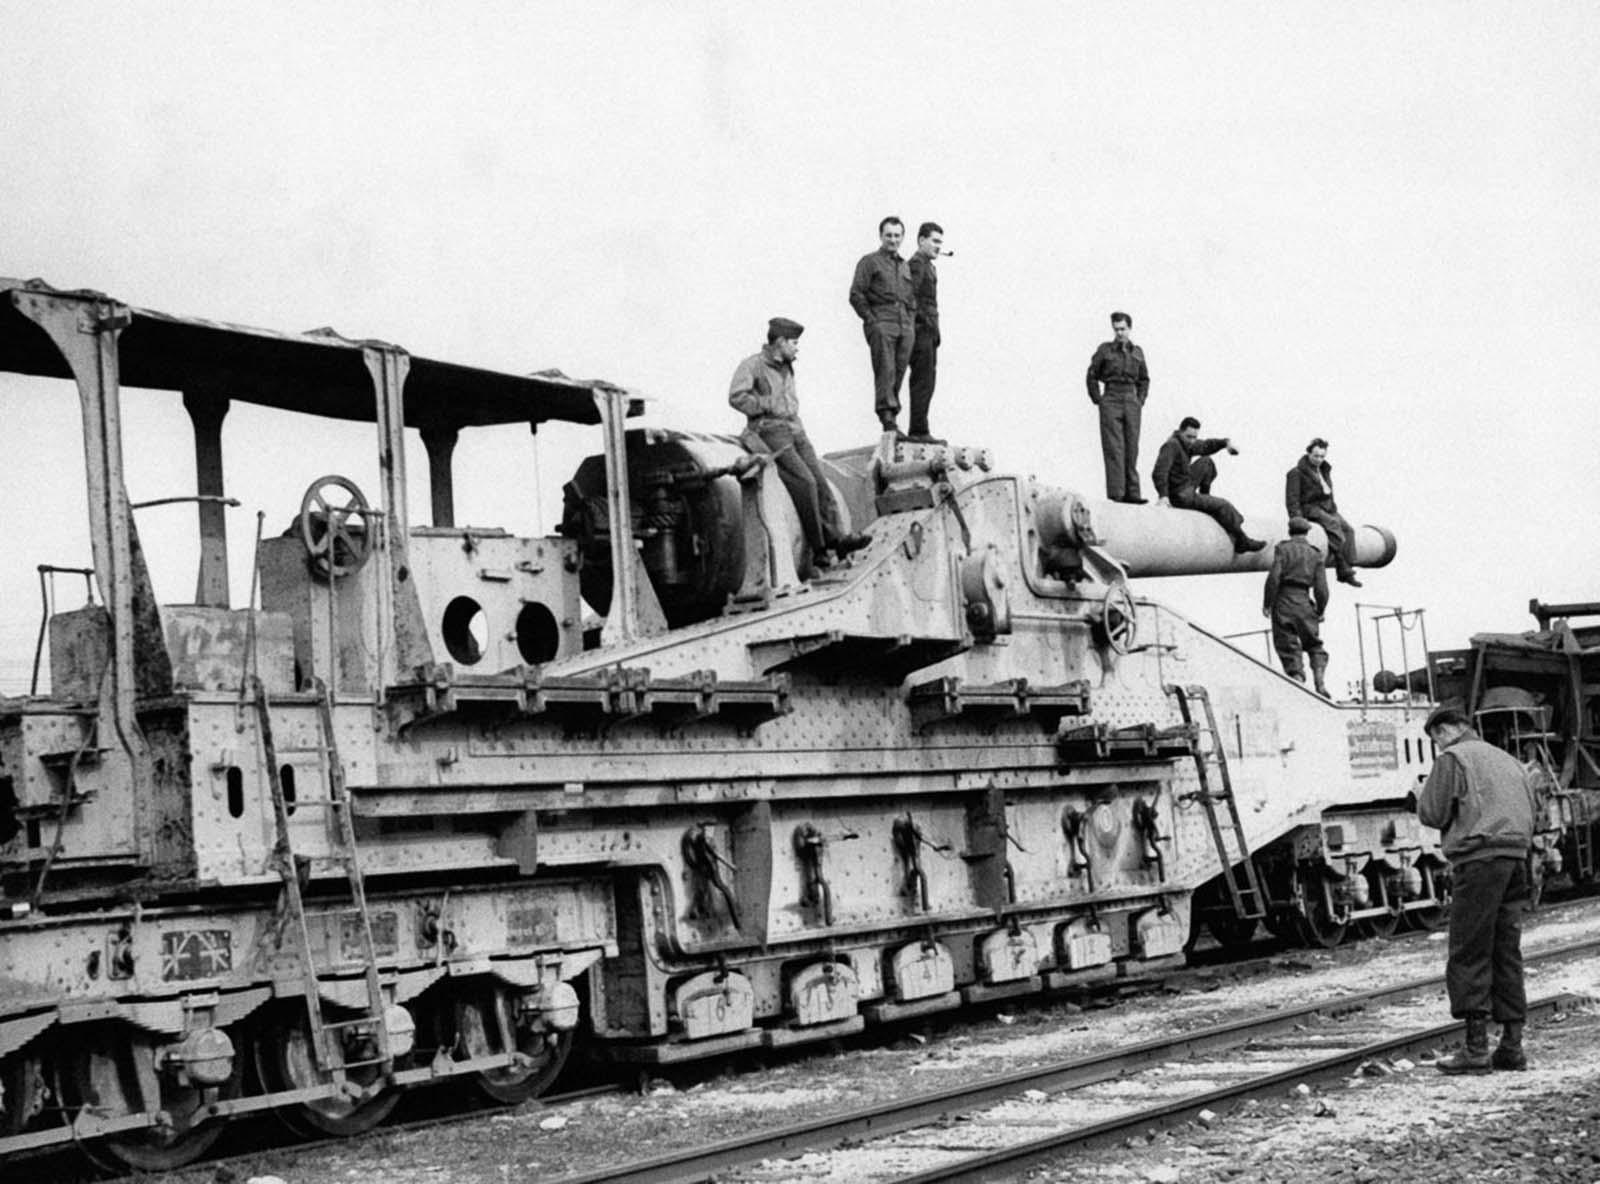 American soldiers pose on a captured German railway gun. 1940.